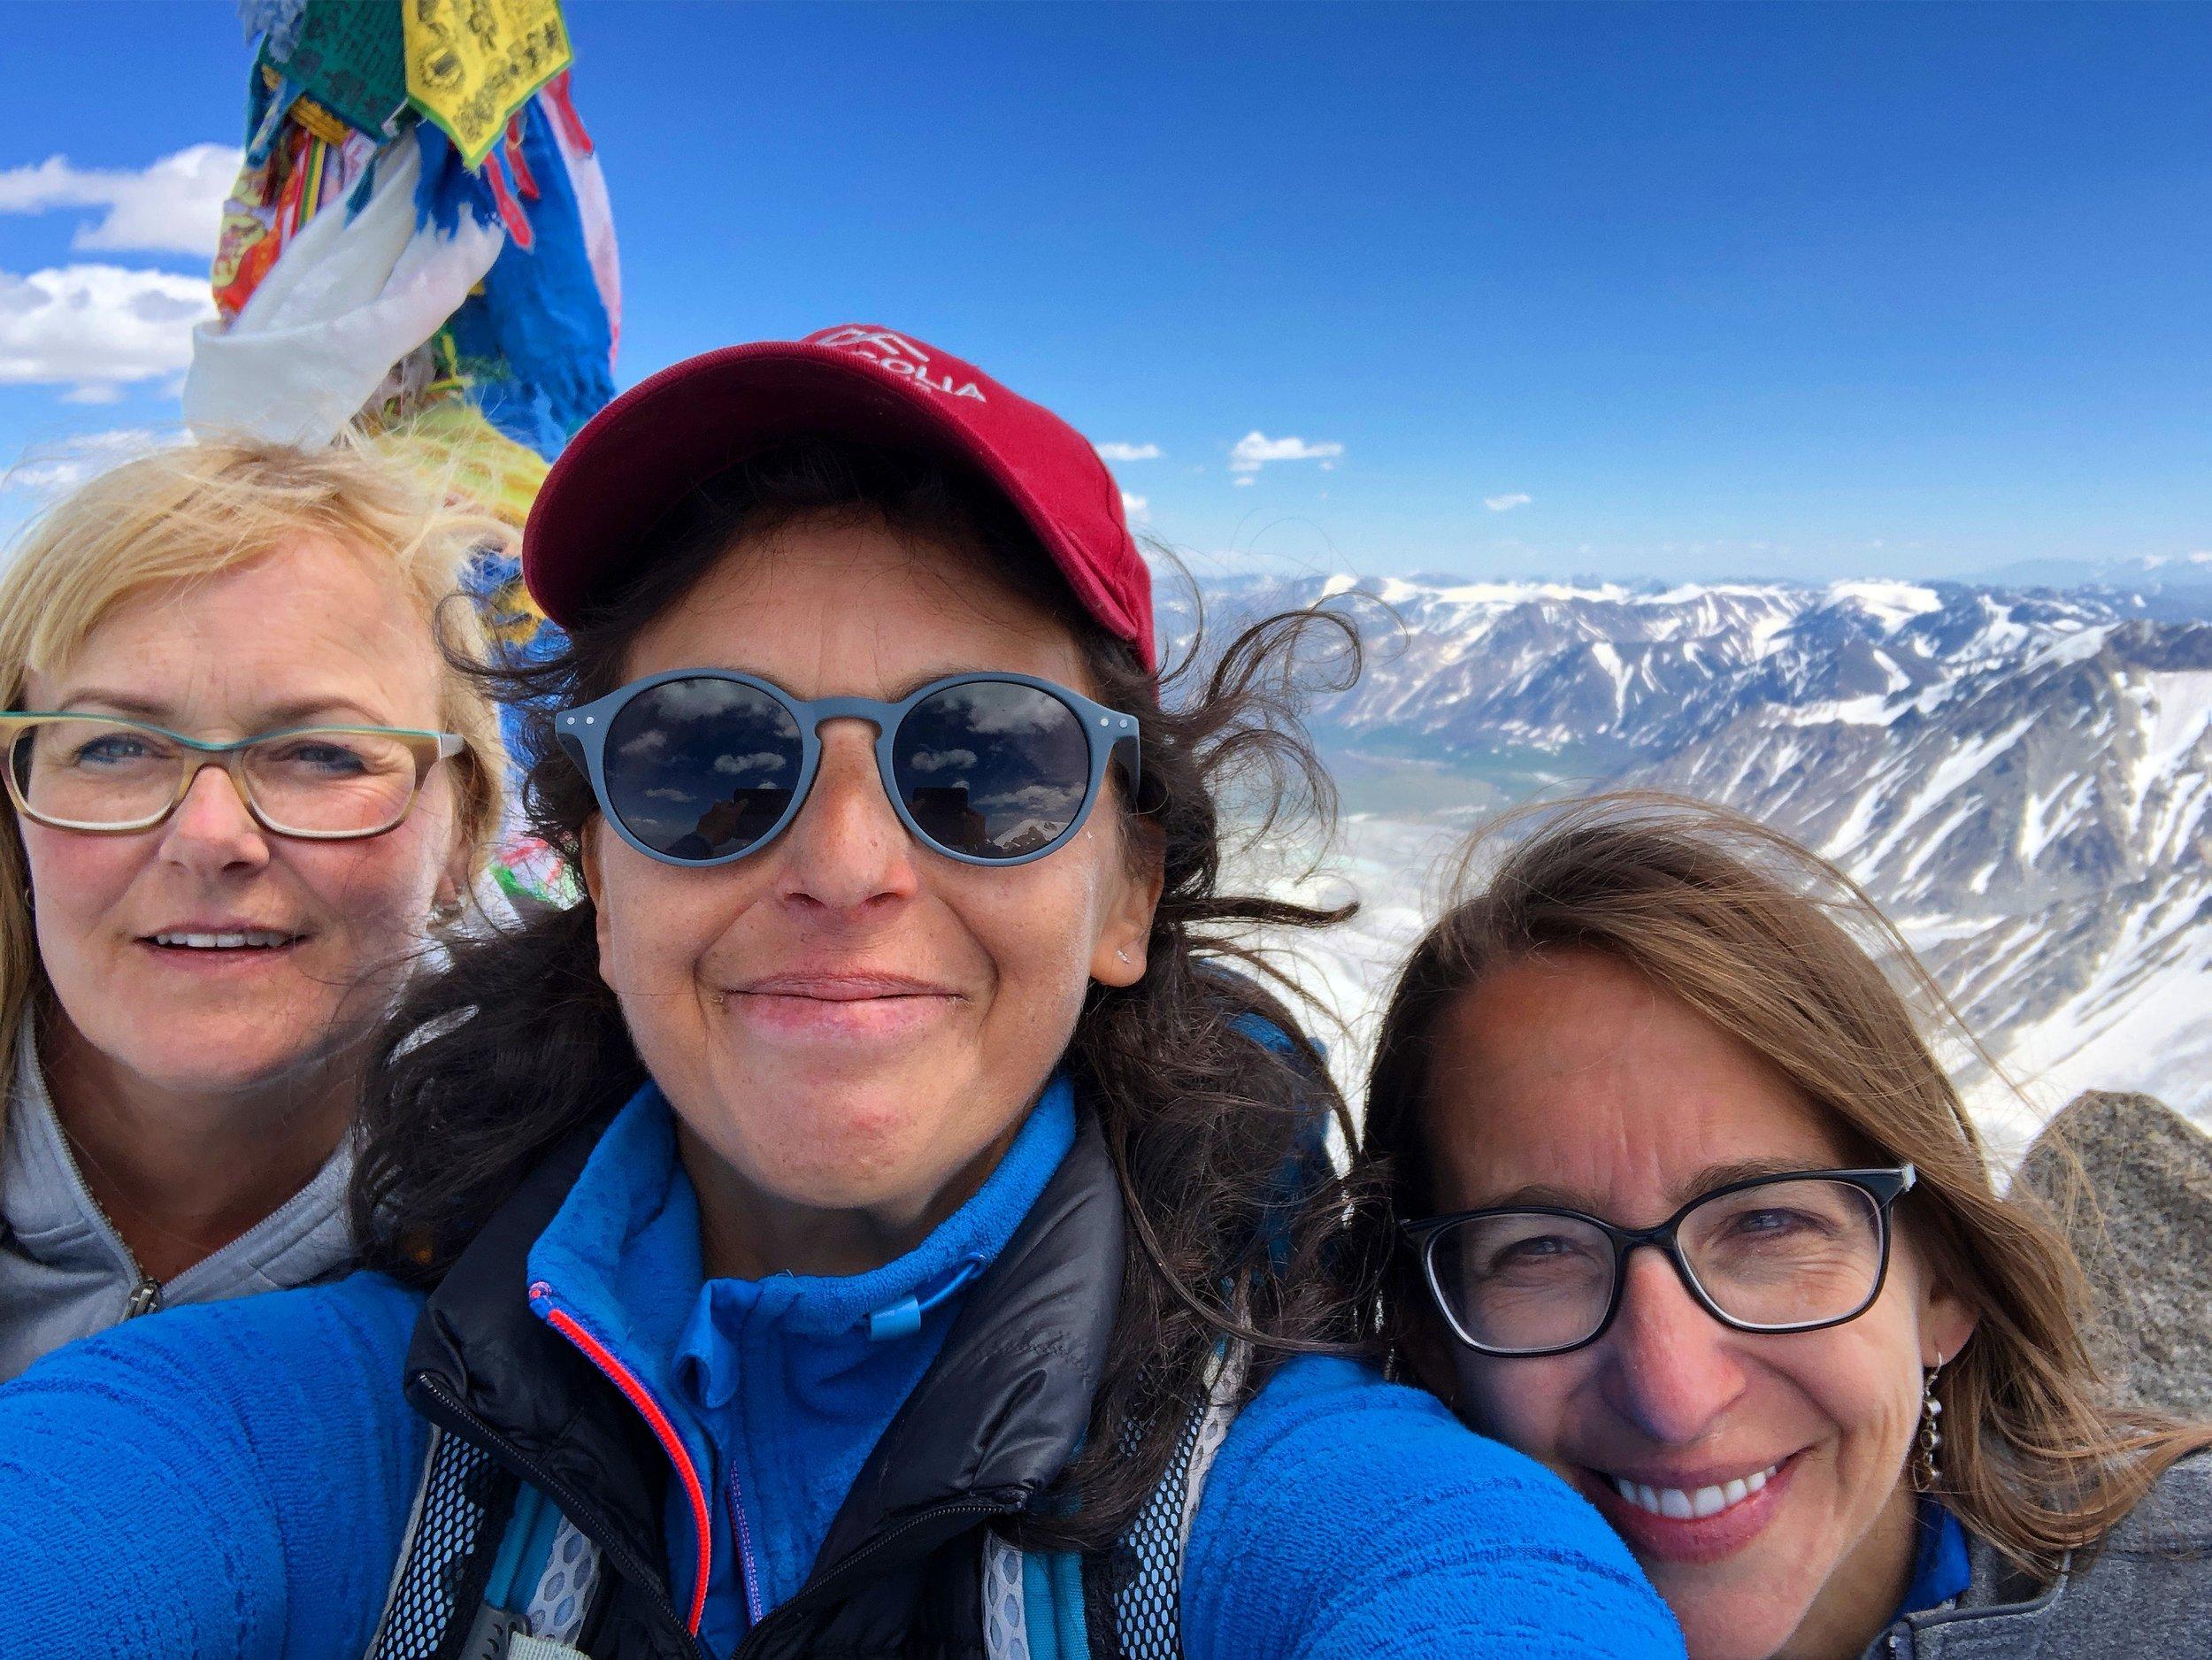 Climbing Malchin Peak in the Tavan Bogd National Park , northwest Mongolia with these two badass women - definitely a highlight.